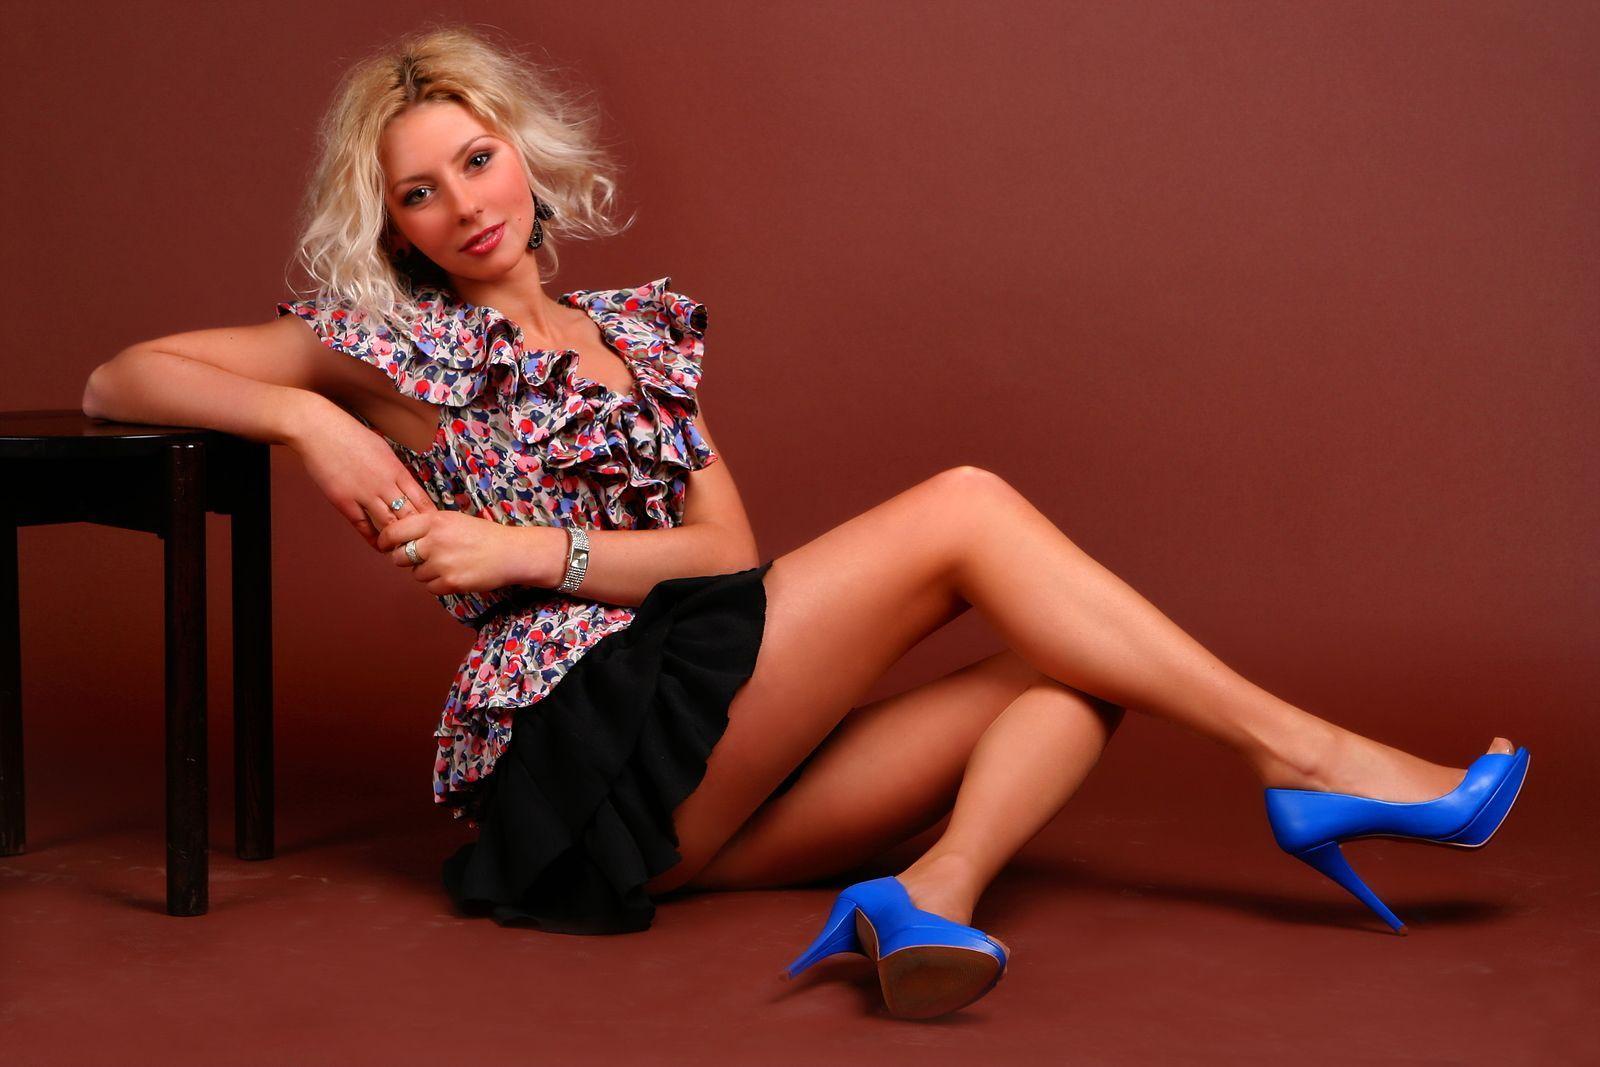 agence rencontre femme moldave